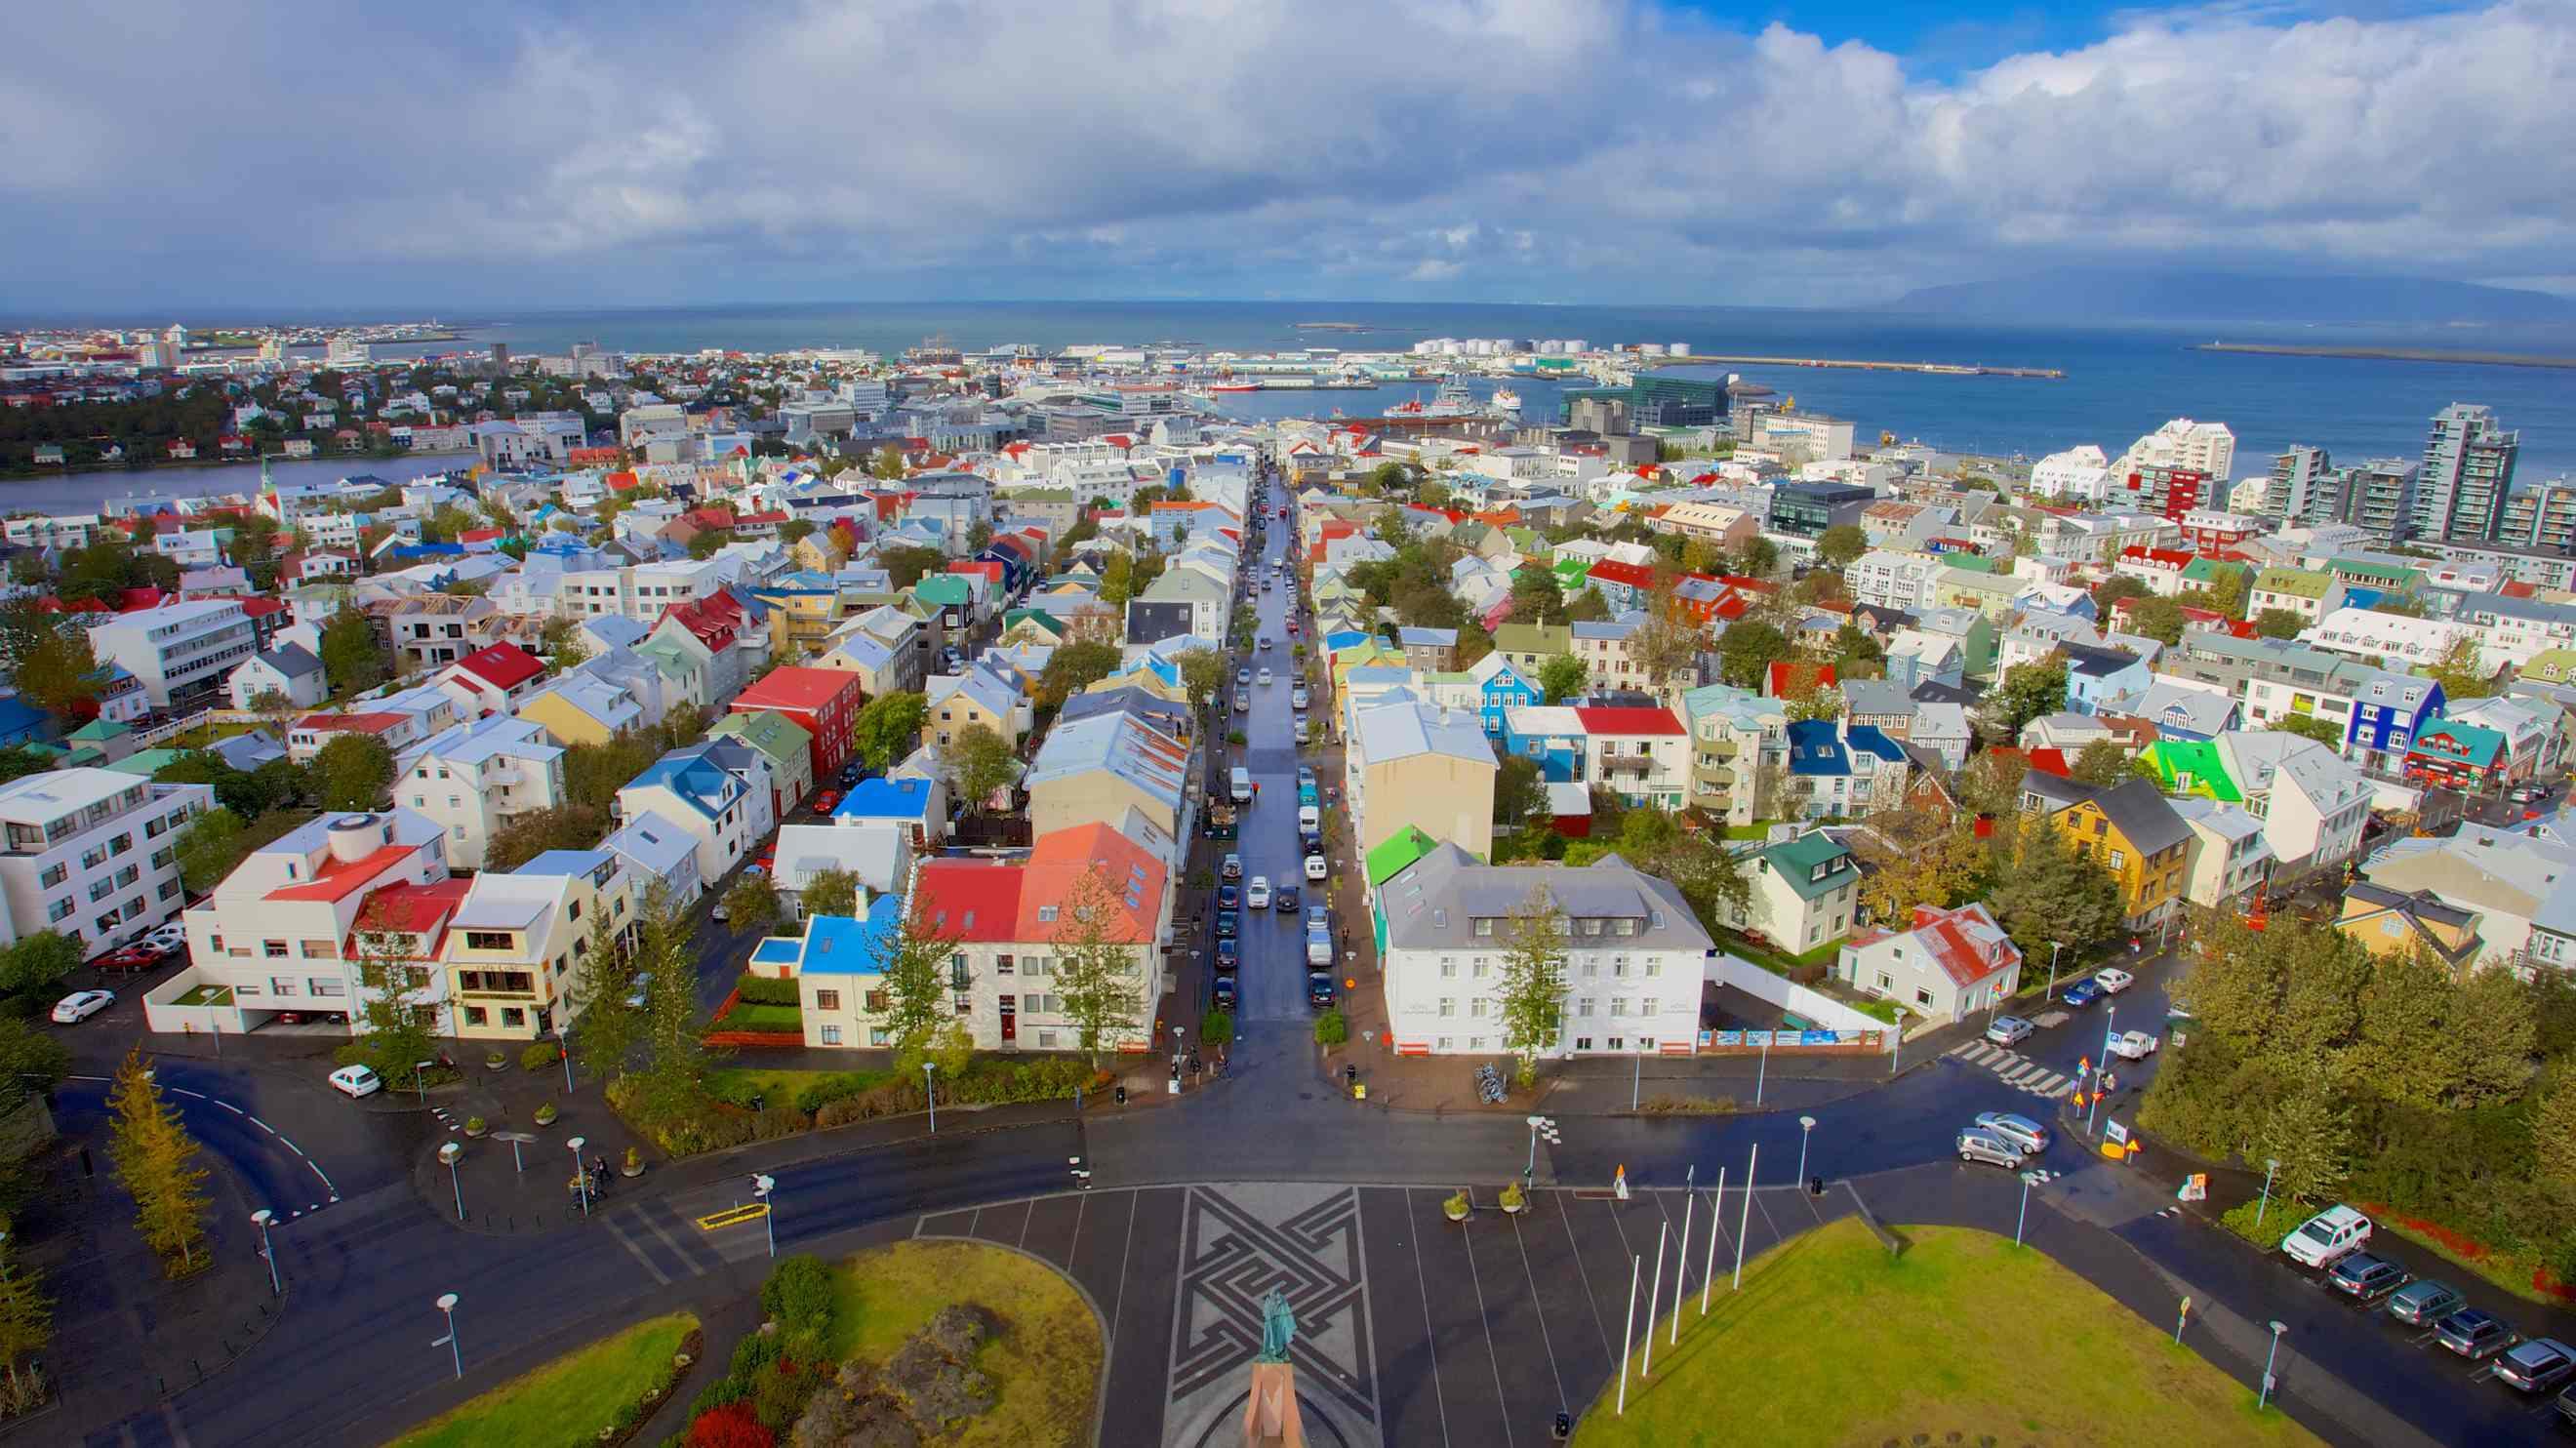 Reise Nach Island Kurzurlaub Mit Expedia De